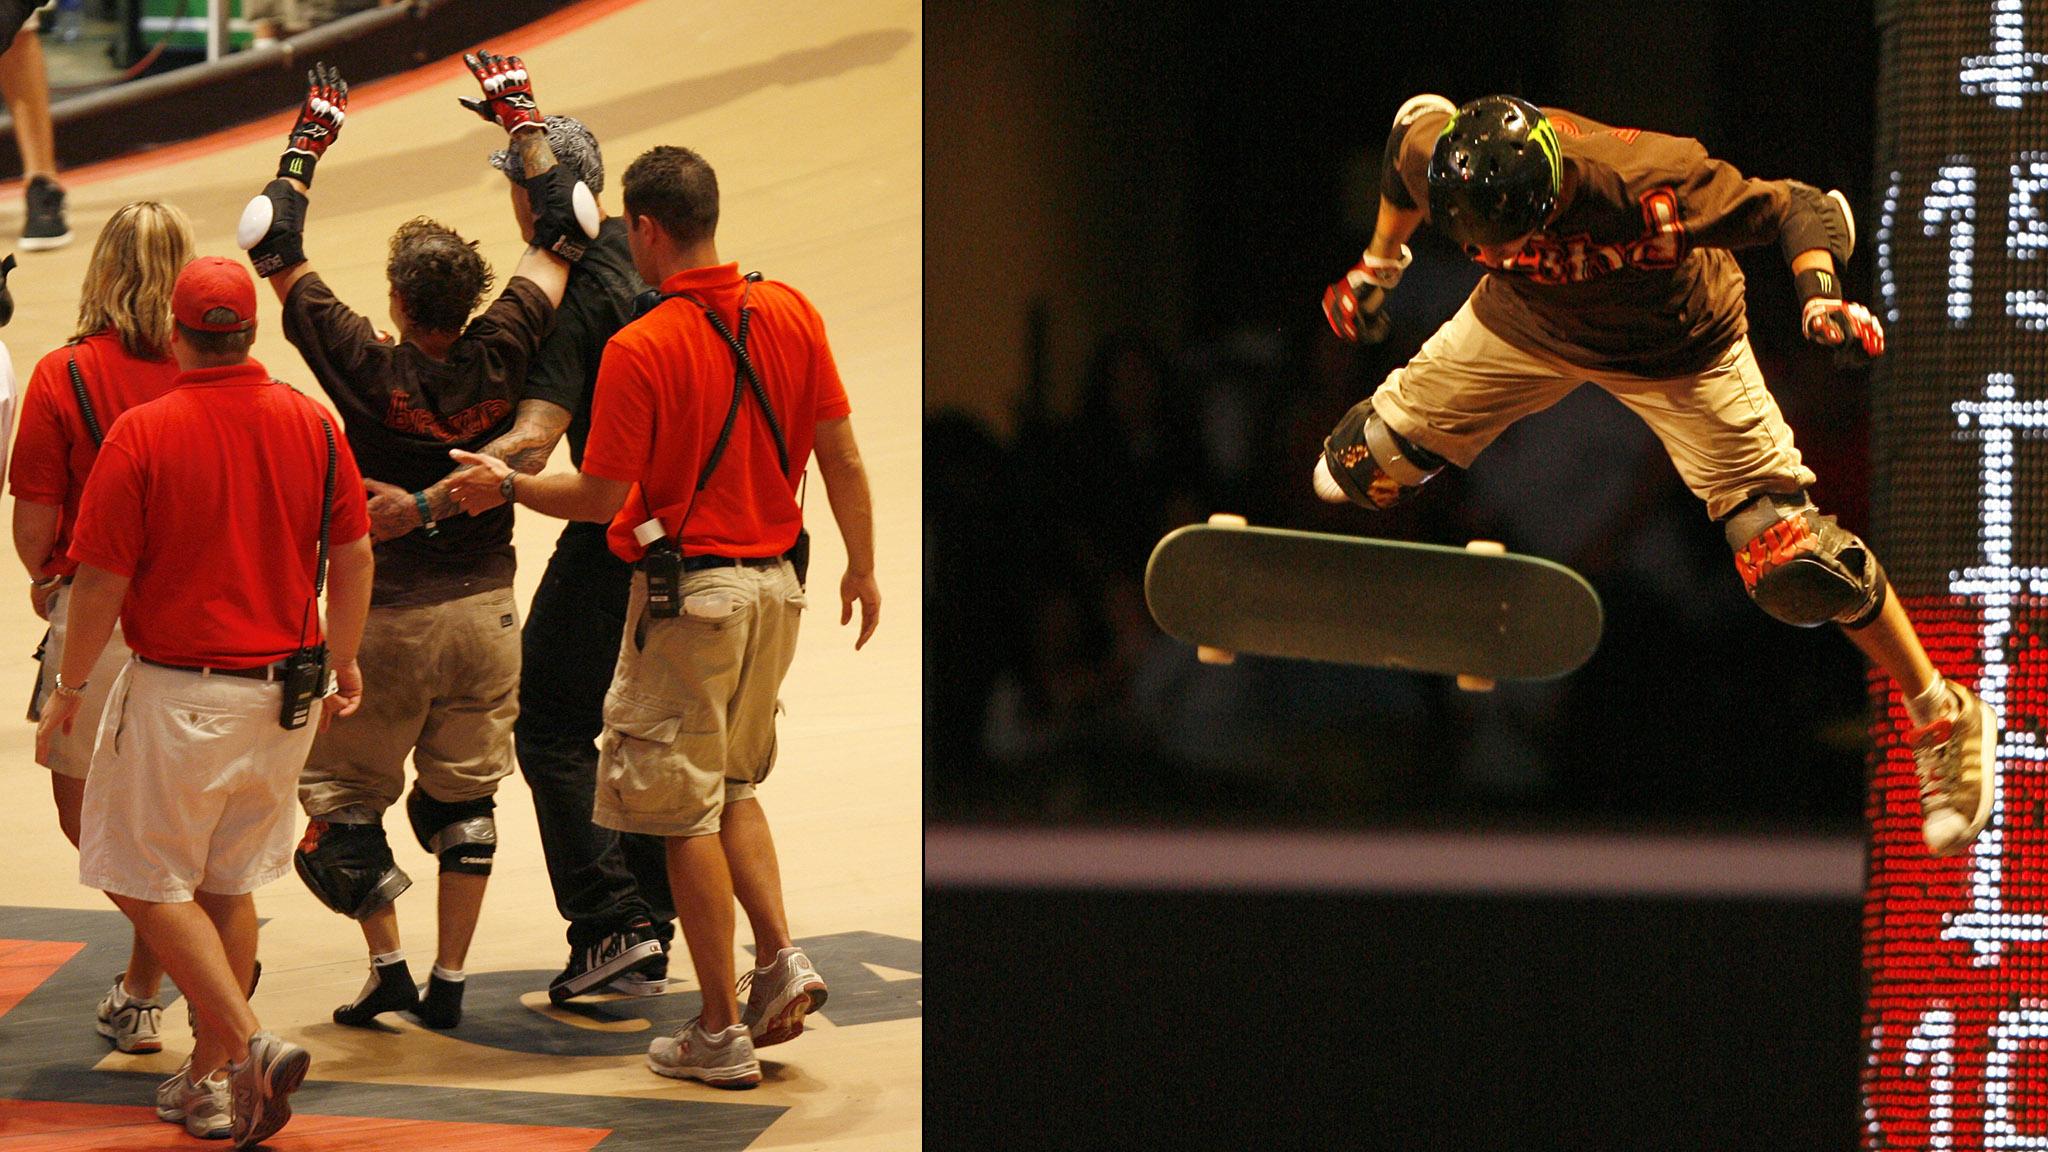 Jake Brown's epic fall, 2007